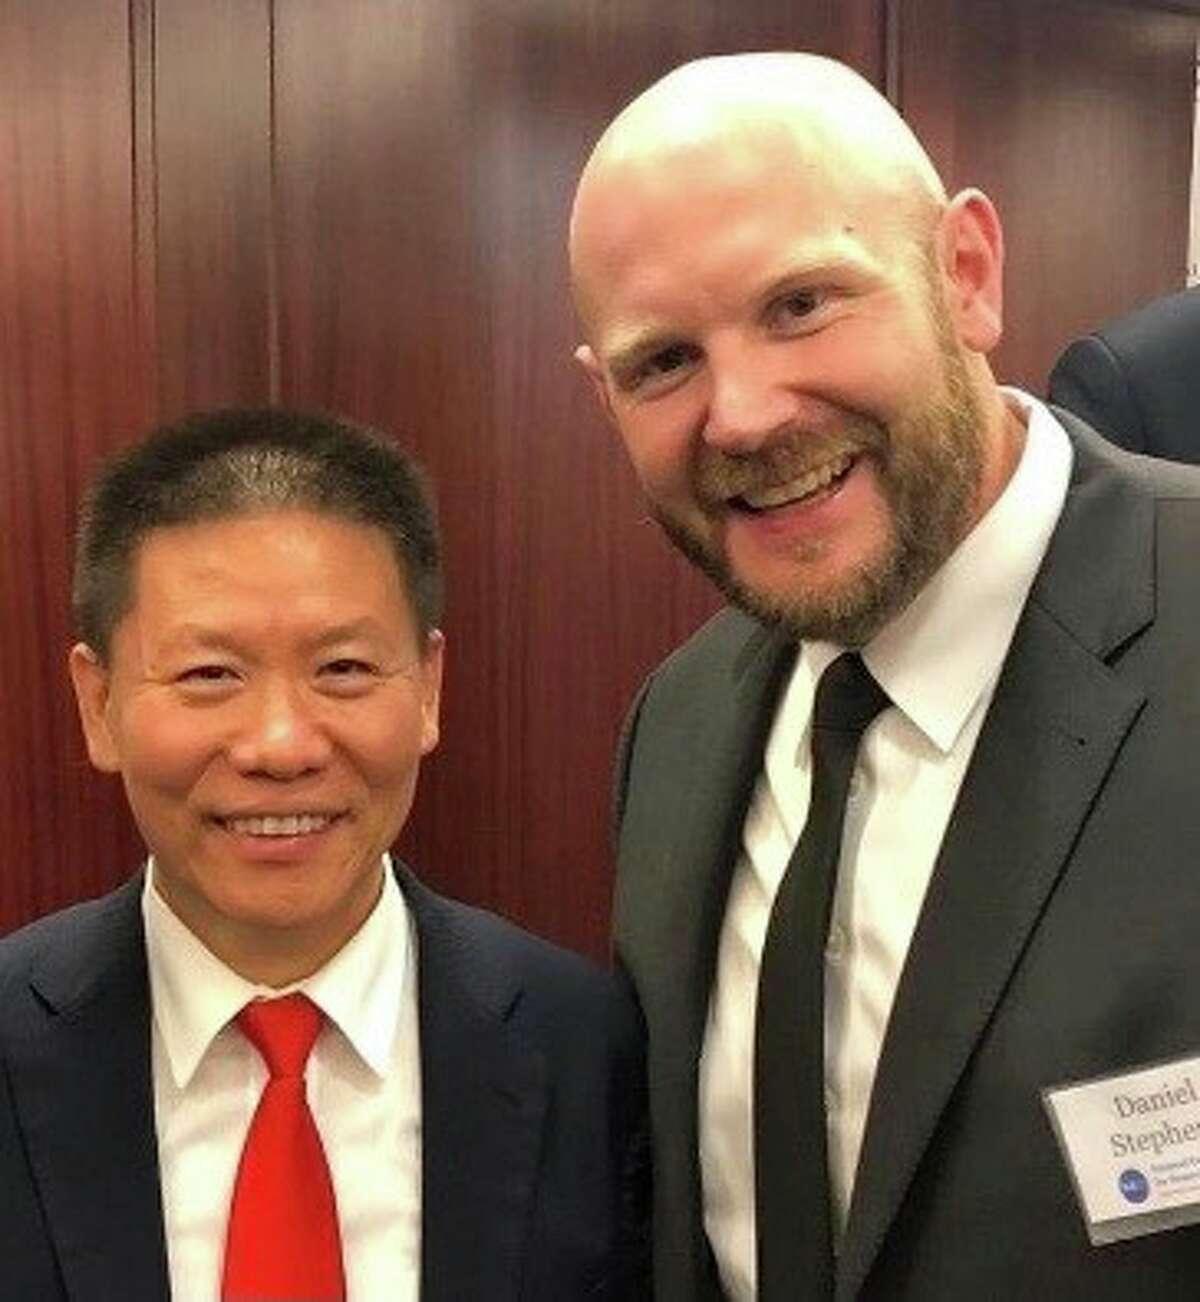 Bob Fu and Daniel Stephens